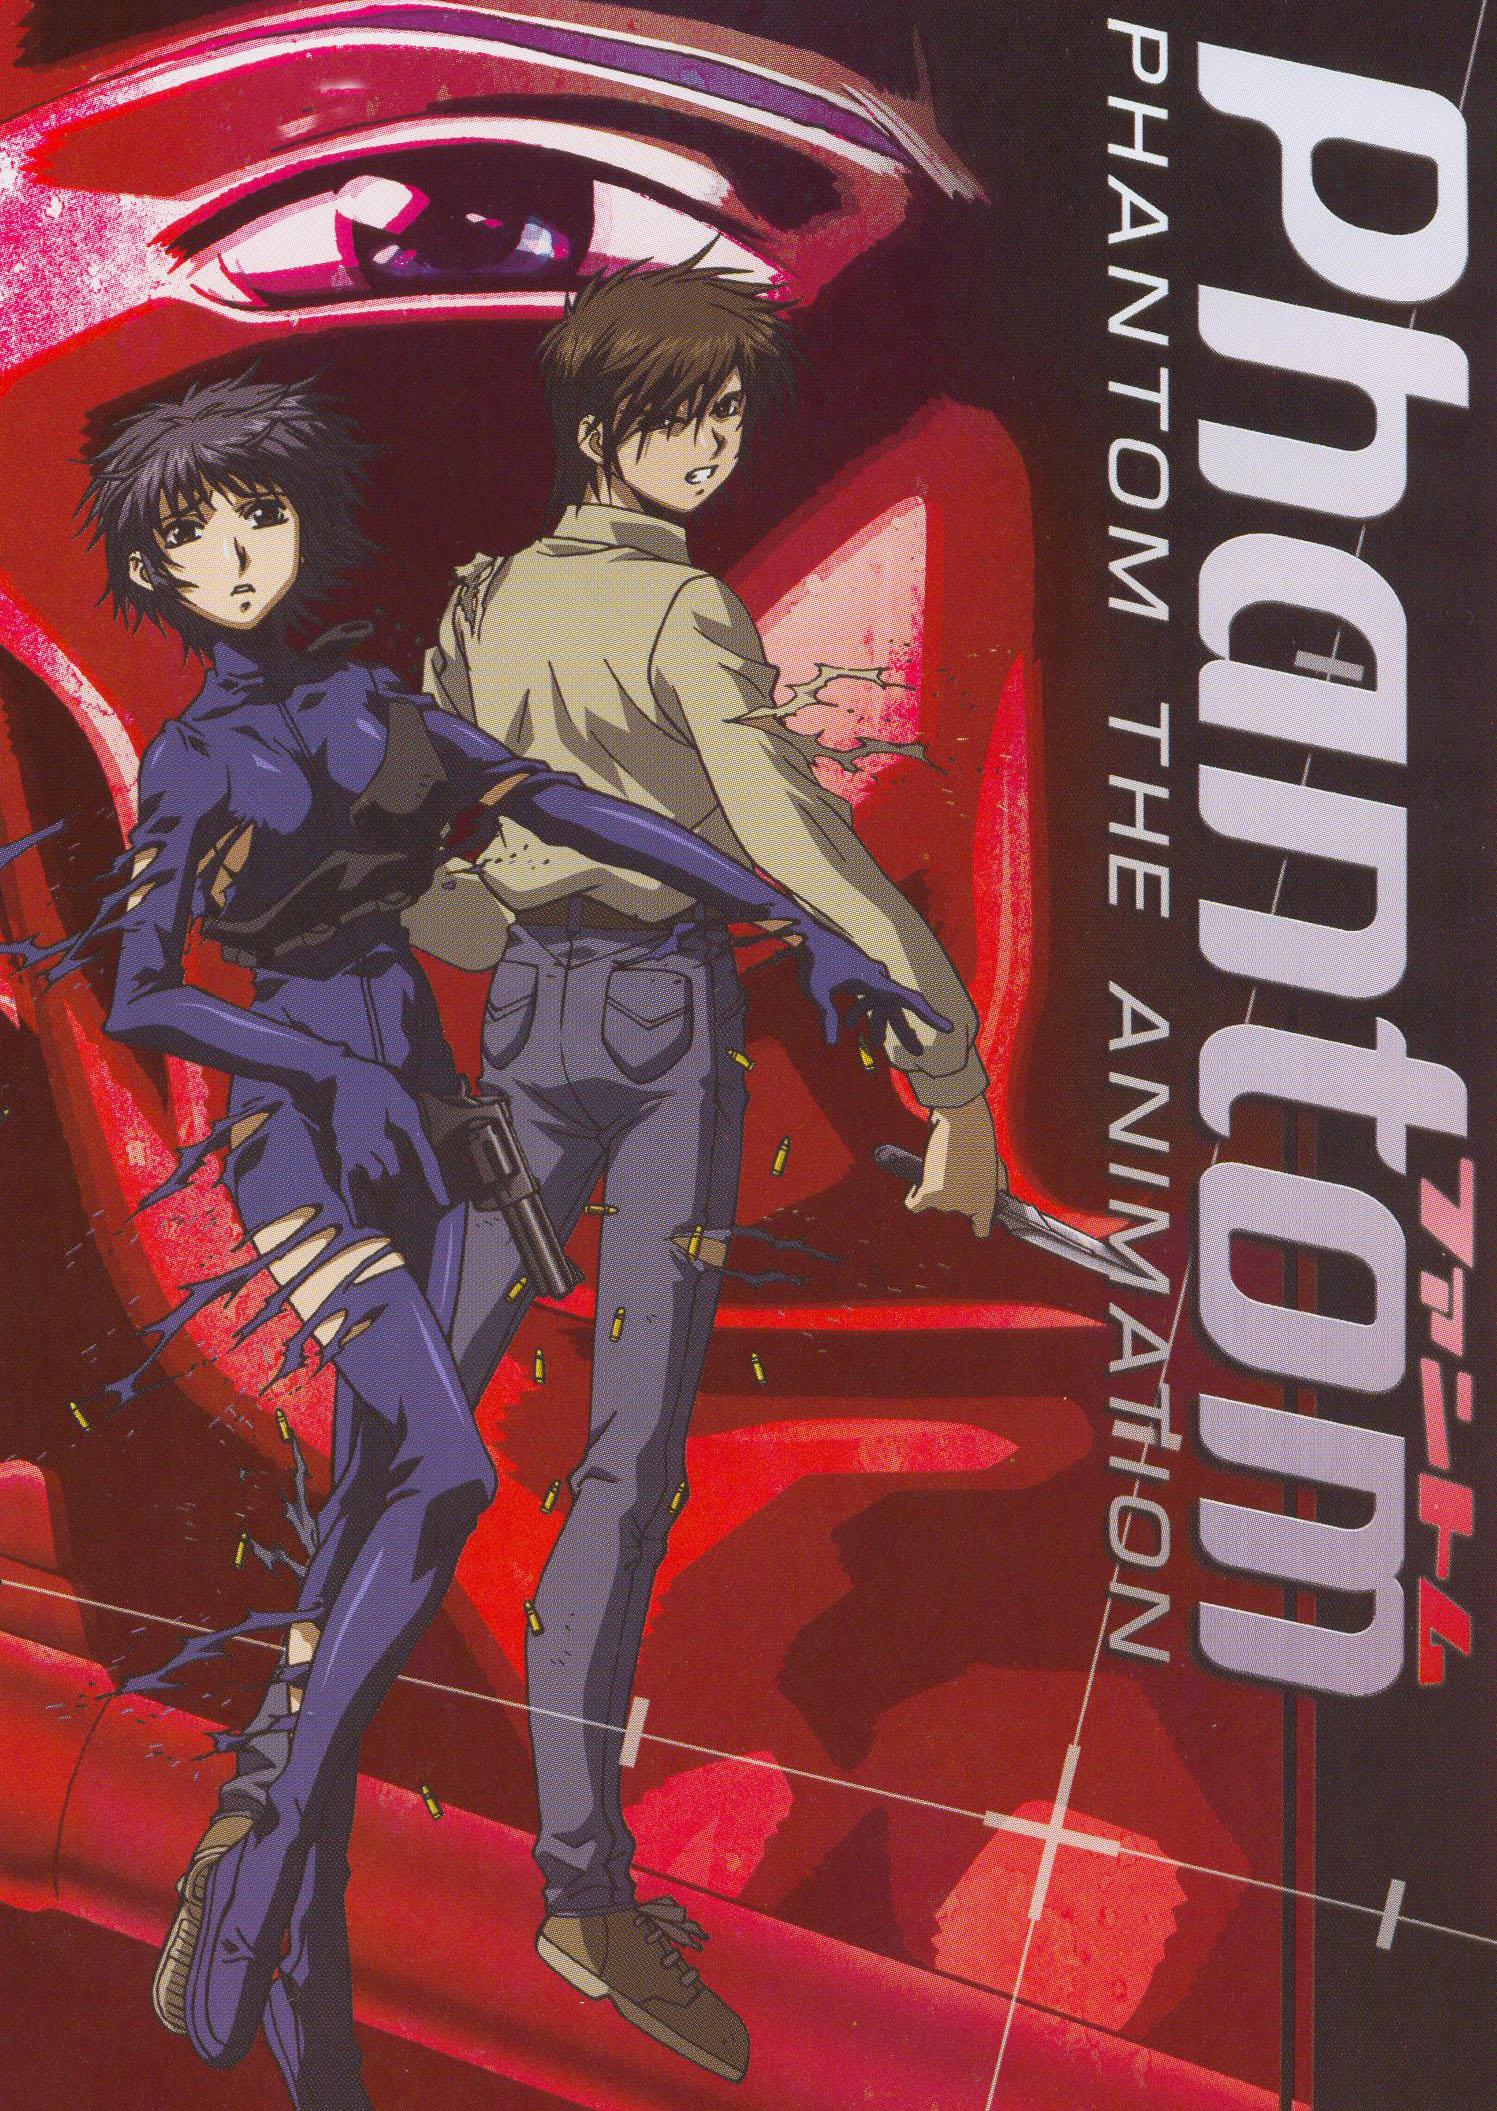 Phantom the Animation [Anime OVA Series]